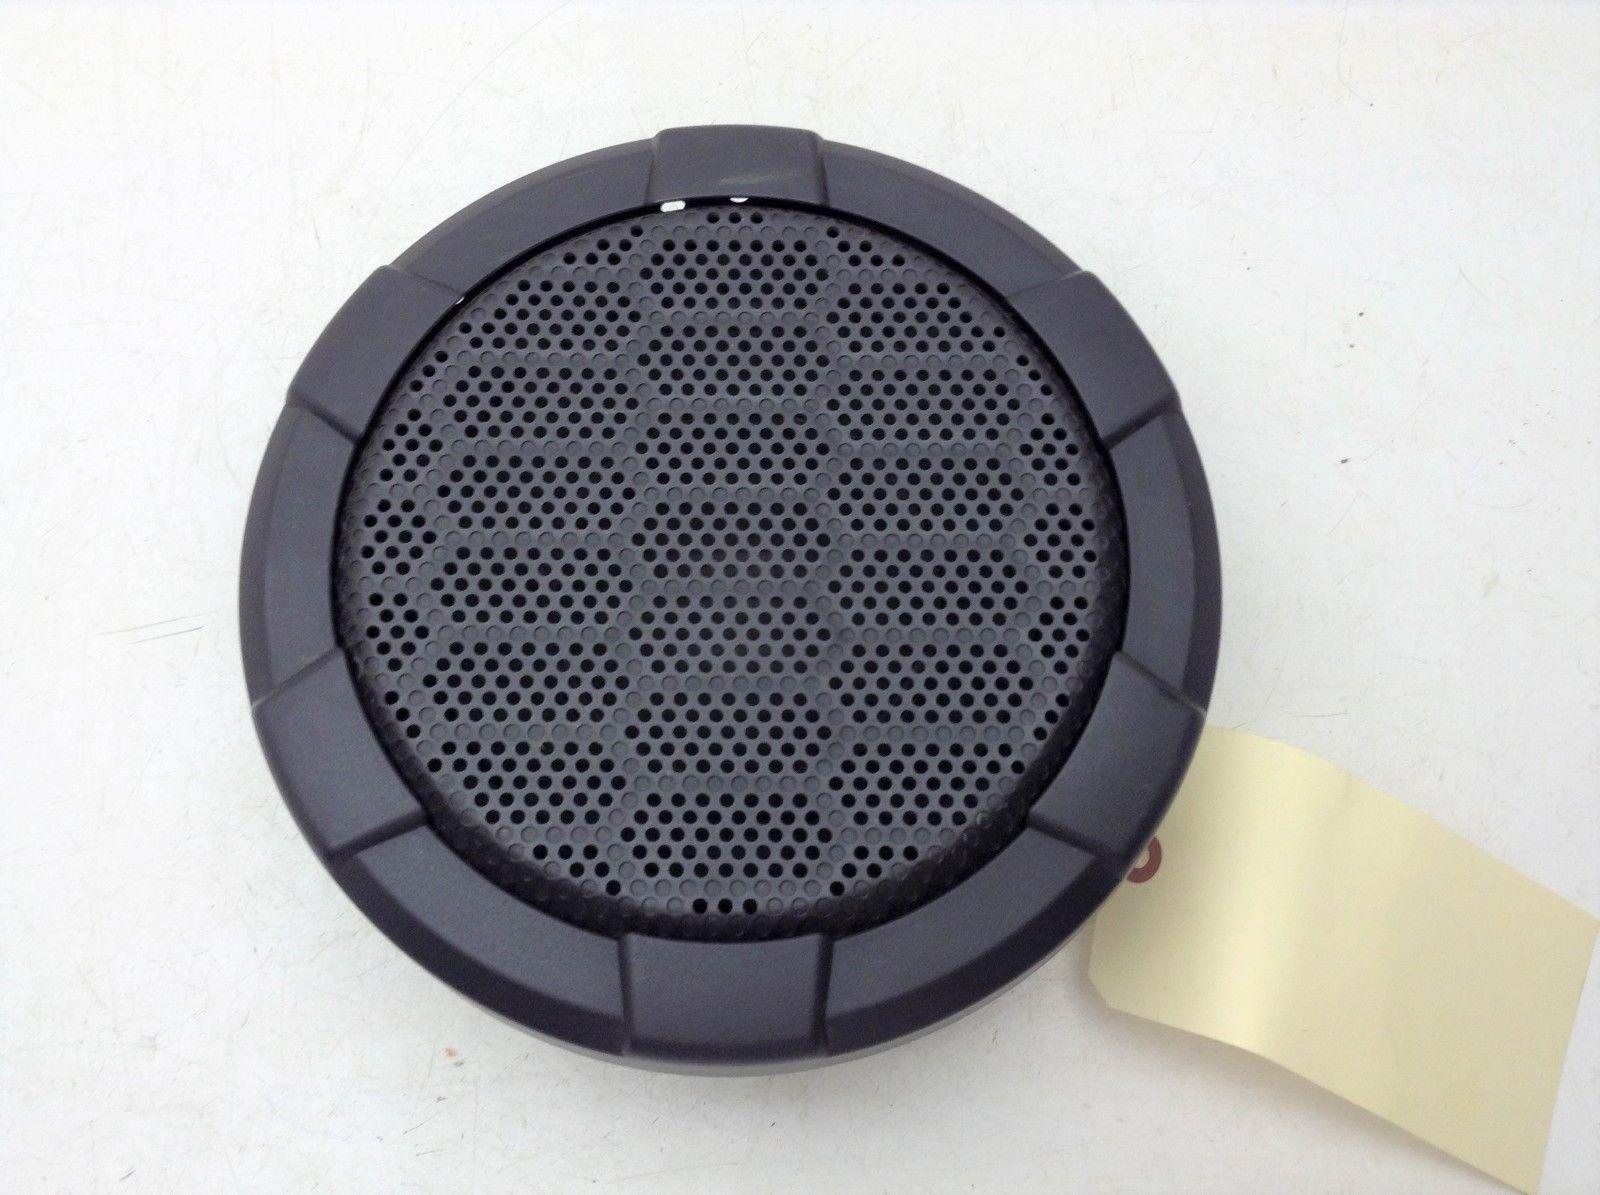 Shaker 8 Subwoofer Details Specs Wiring Diagram Besides 2 Ohm On Kicker Comp 07 09 Door Subwoofers